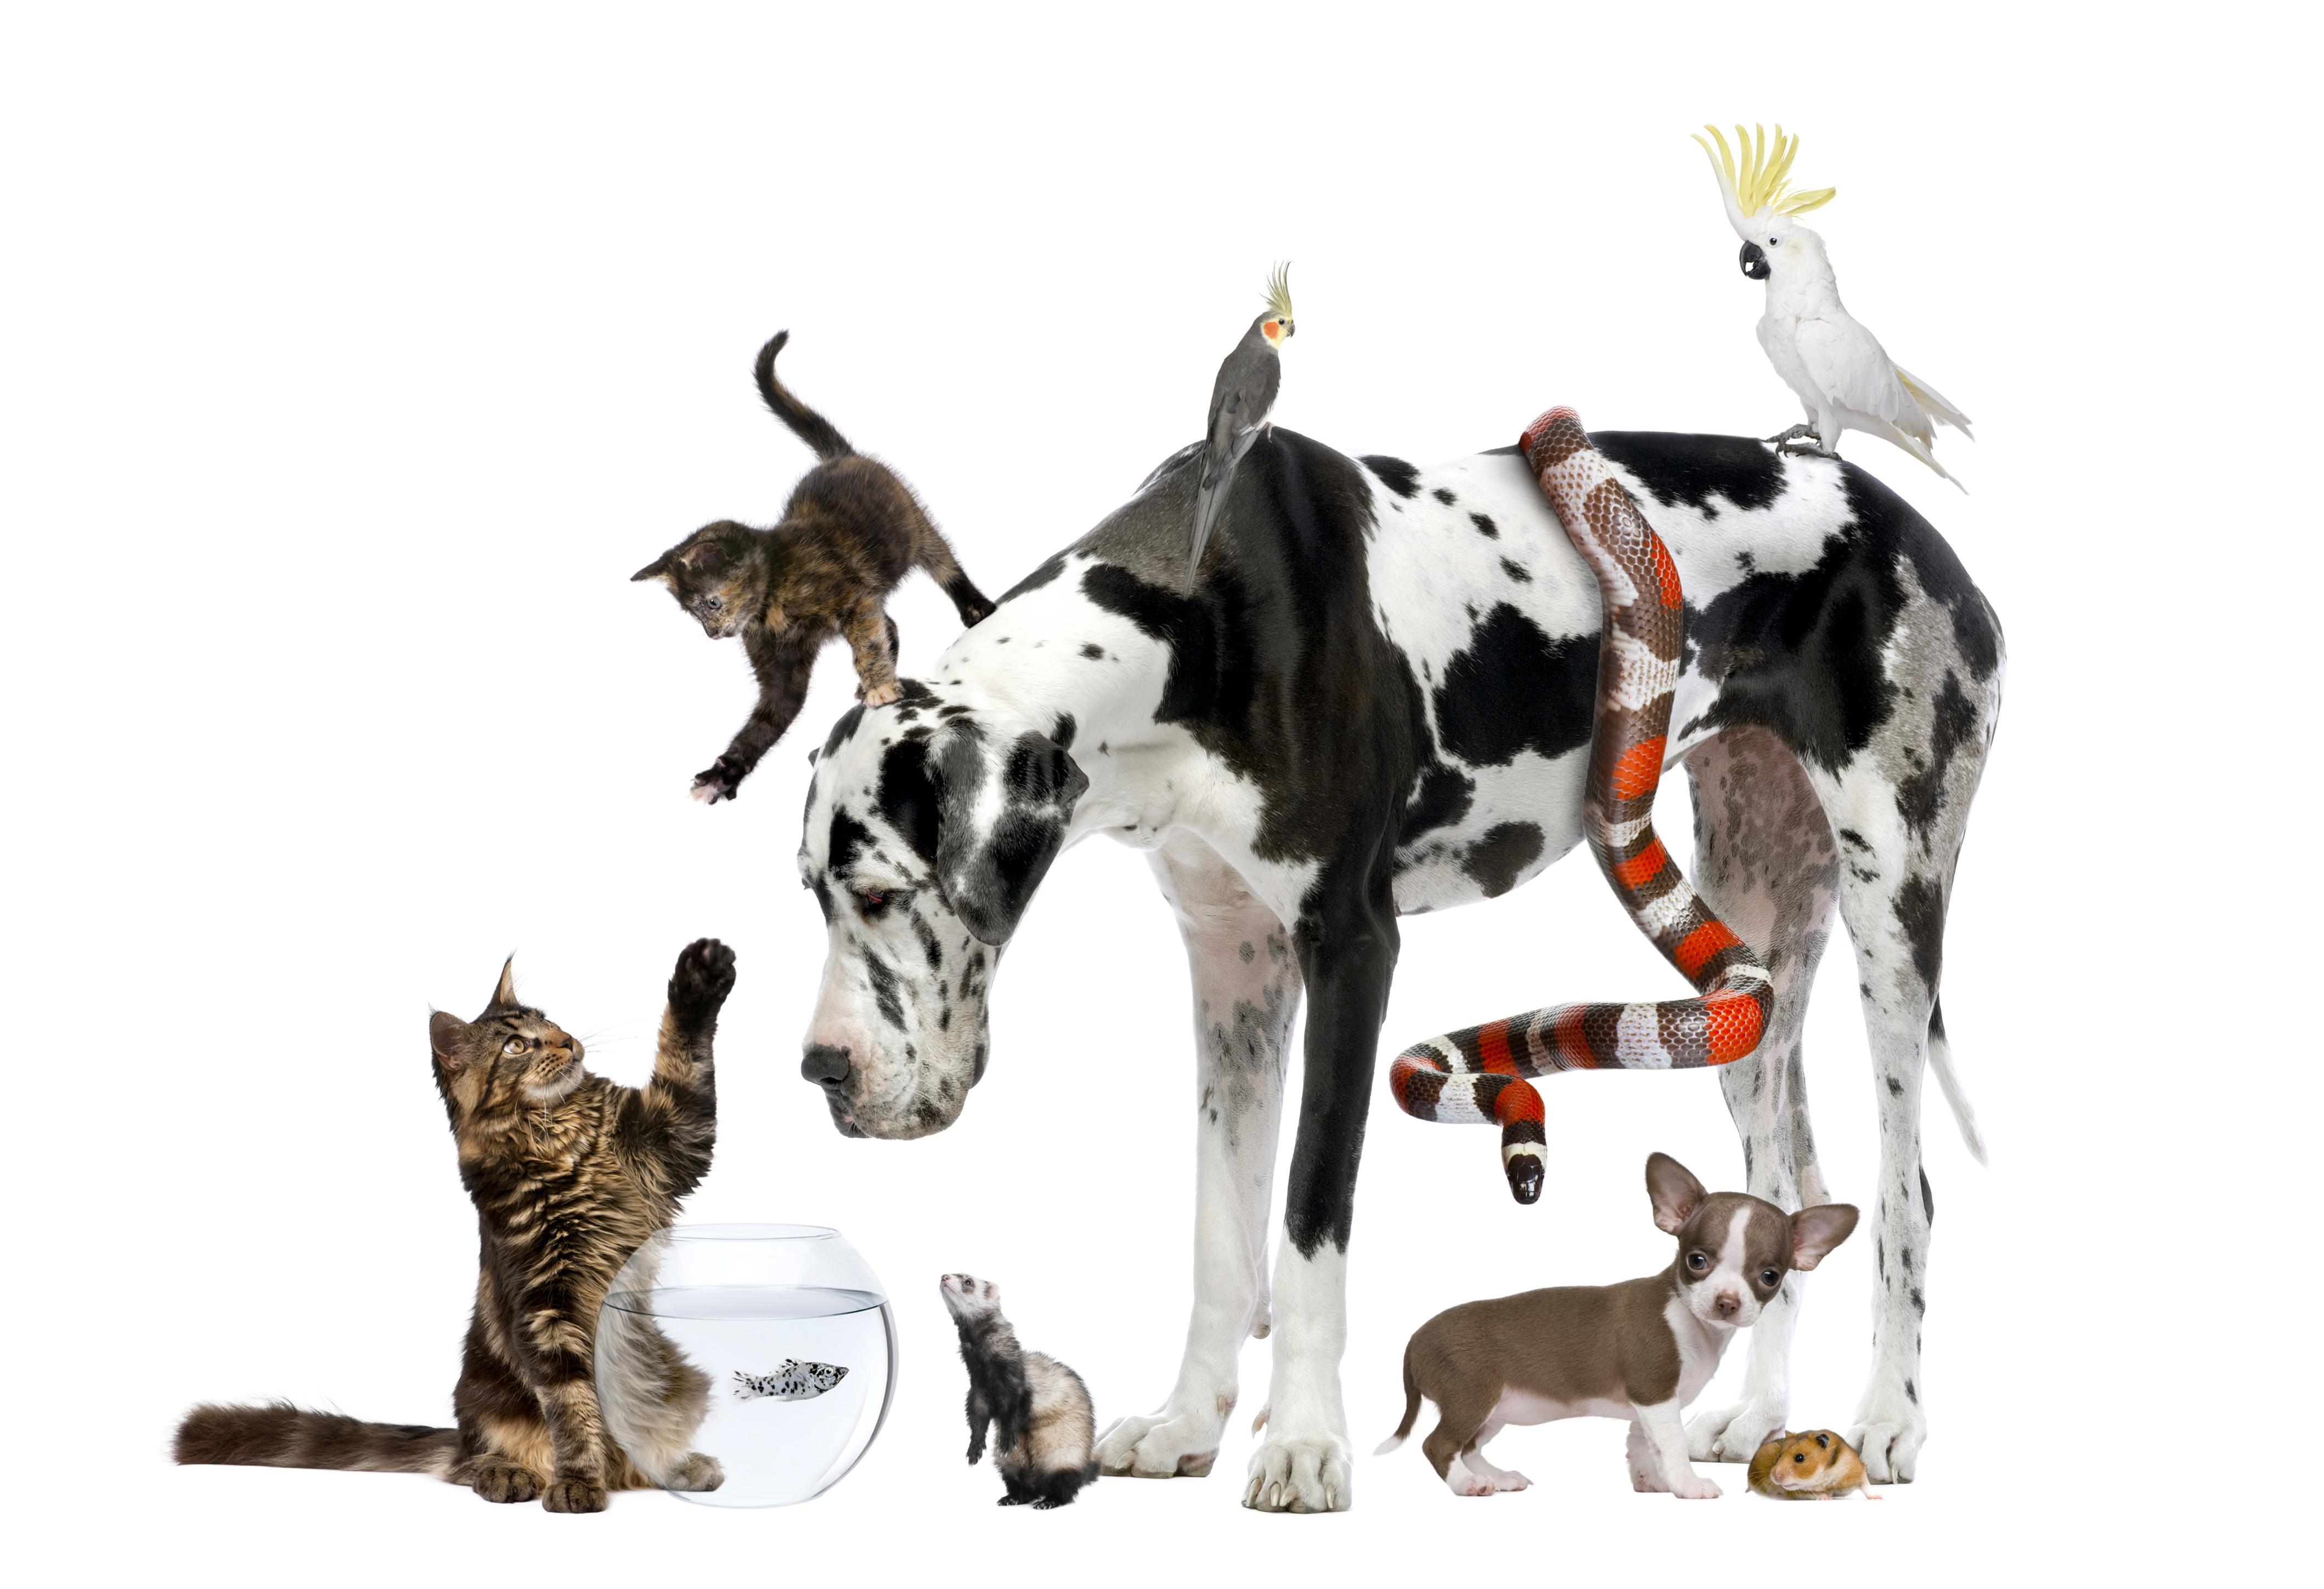 Картинка котят Еноты щенка Чихуахуа далматинцев кот Змеи собака Попугаи Морские свинки животное белом фоне щенки Щенок Котята щенков котенка котенок Далматин далматинца Далматинец коты Кошки кошка Собаки Животные Белый фон белым фоном